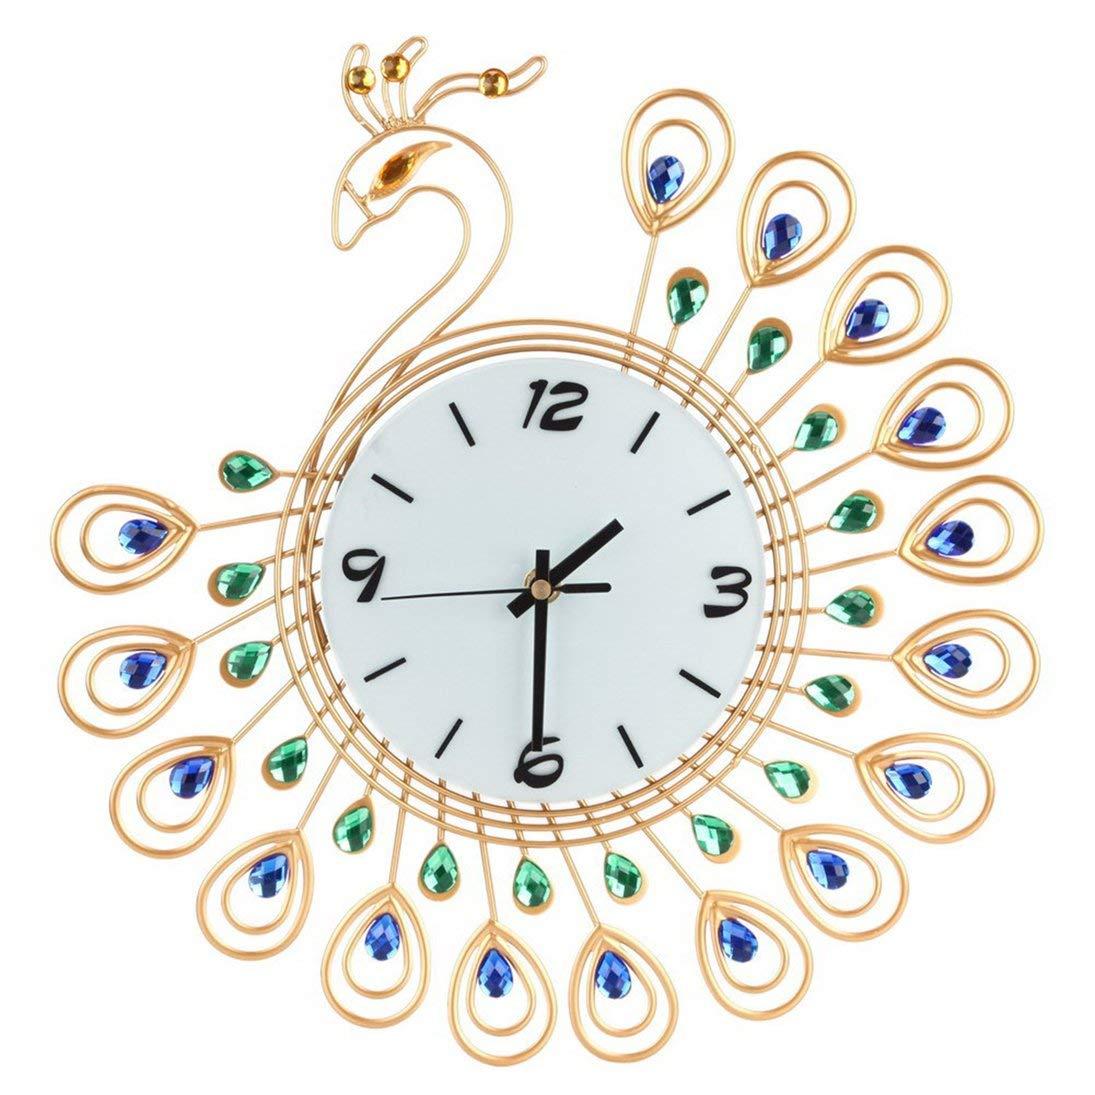 Baynne Peacock Crystal Metal Clock Silent 3D Wall Clock Peacock 36pcs Diamonds Decorative Clock Diameter by Baynne